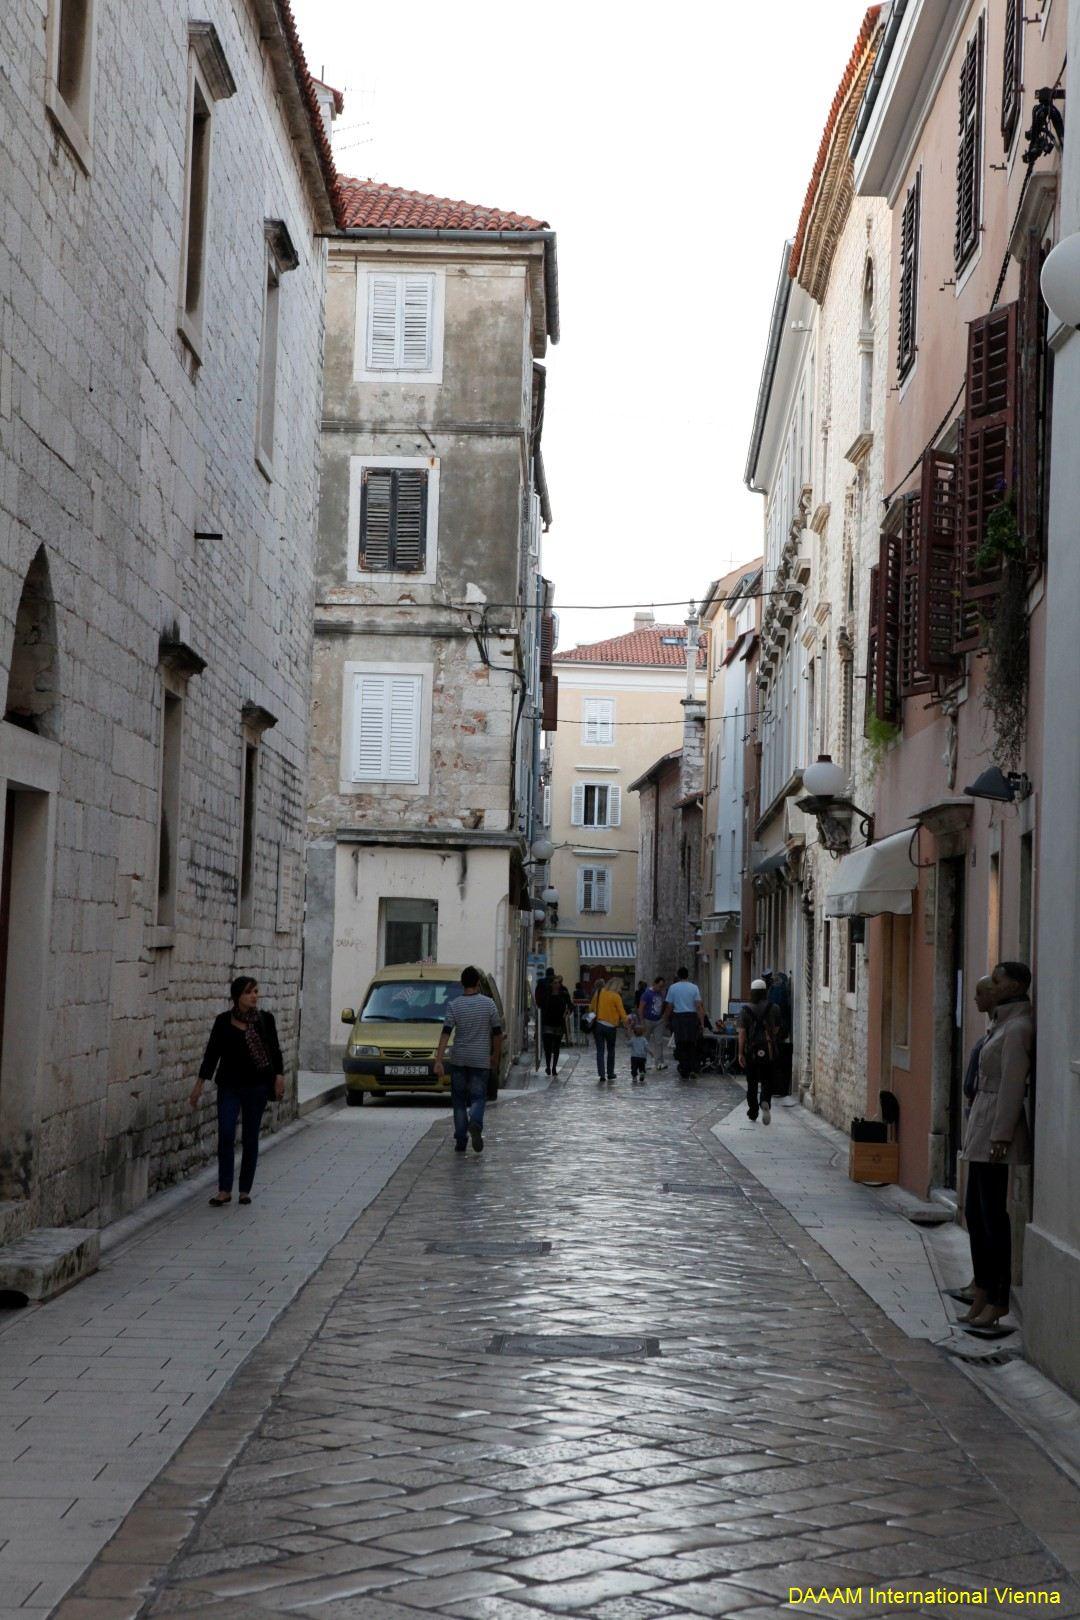 DAAAM_2012_Zadar_00_Zadar_City_005